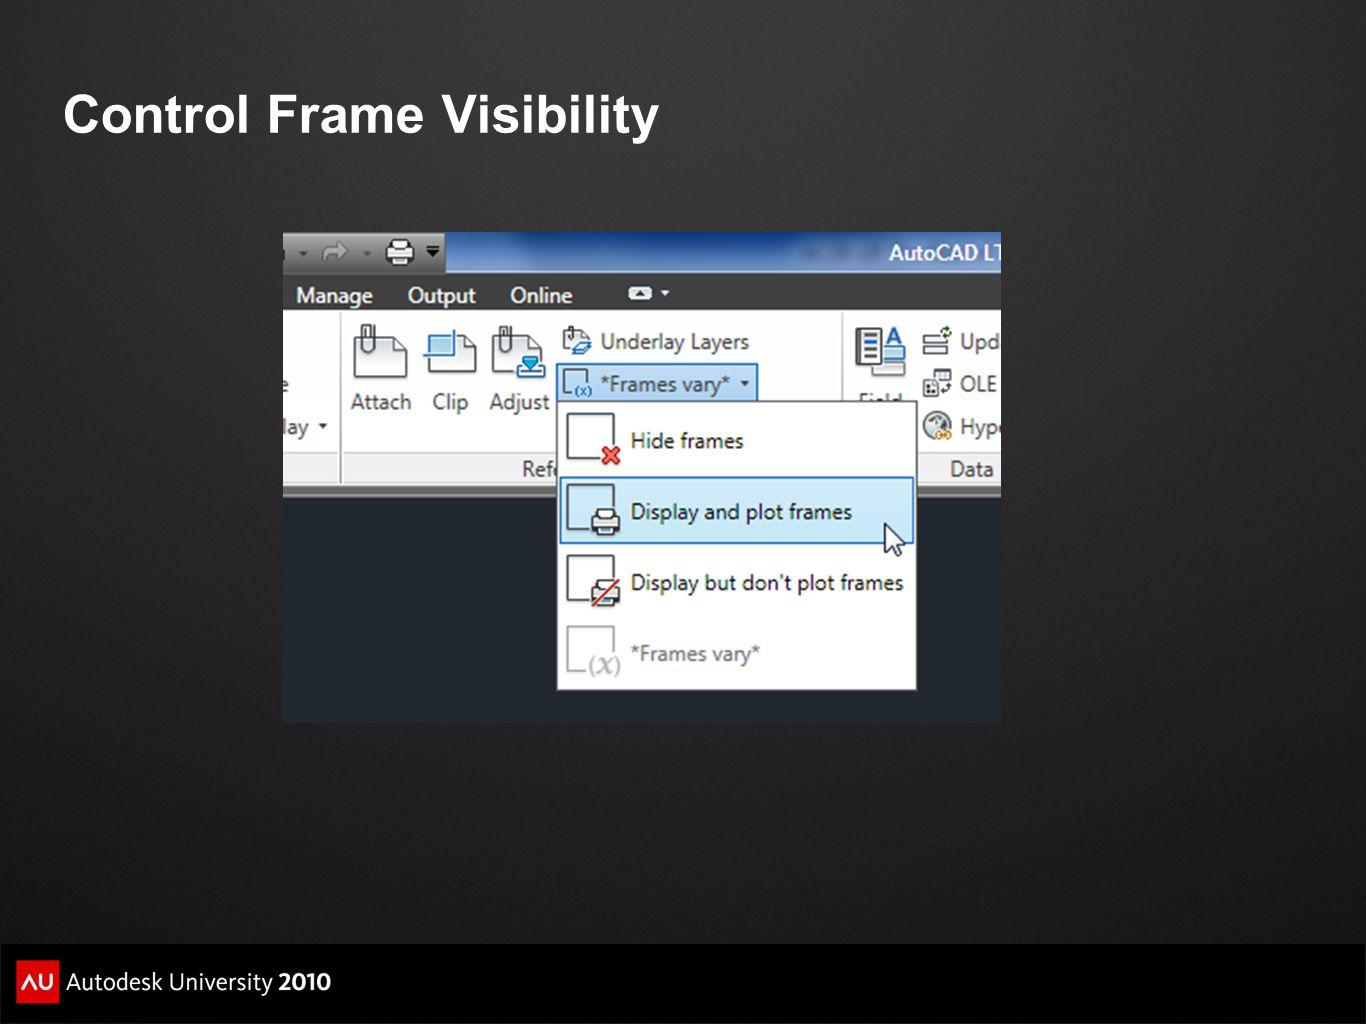 Control Frame Visibility